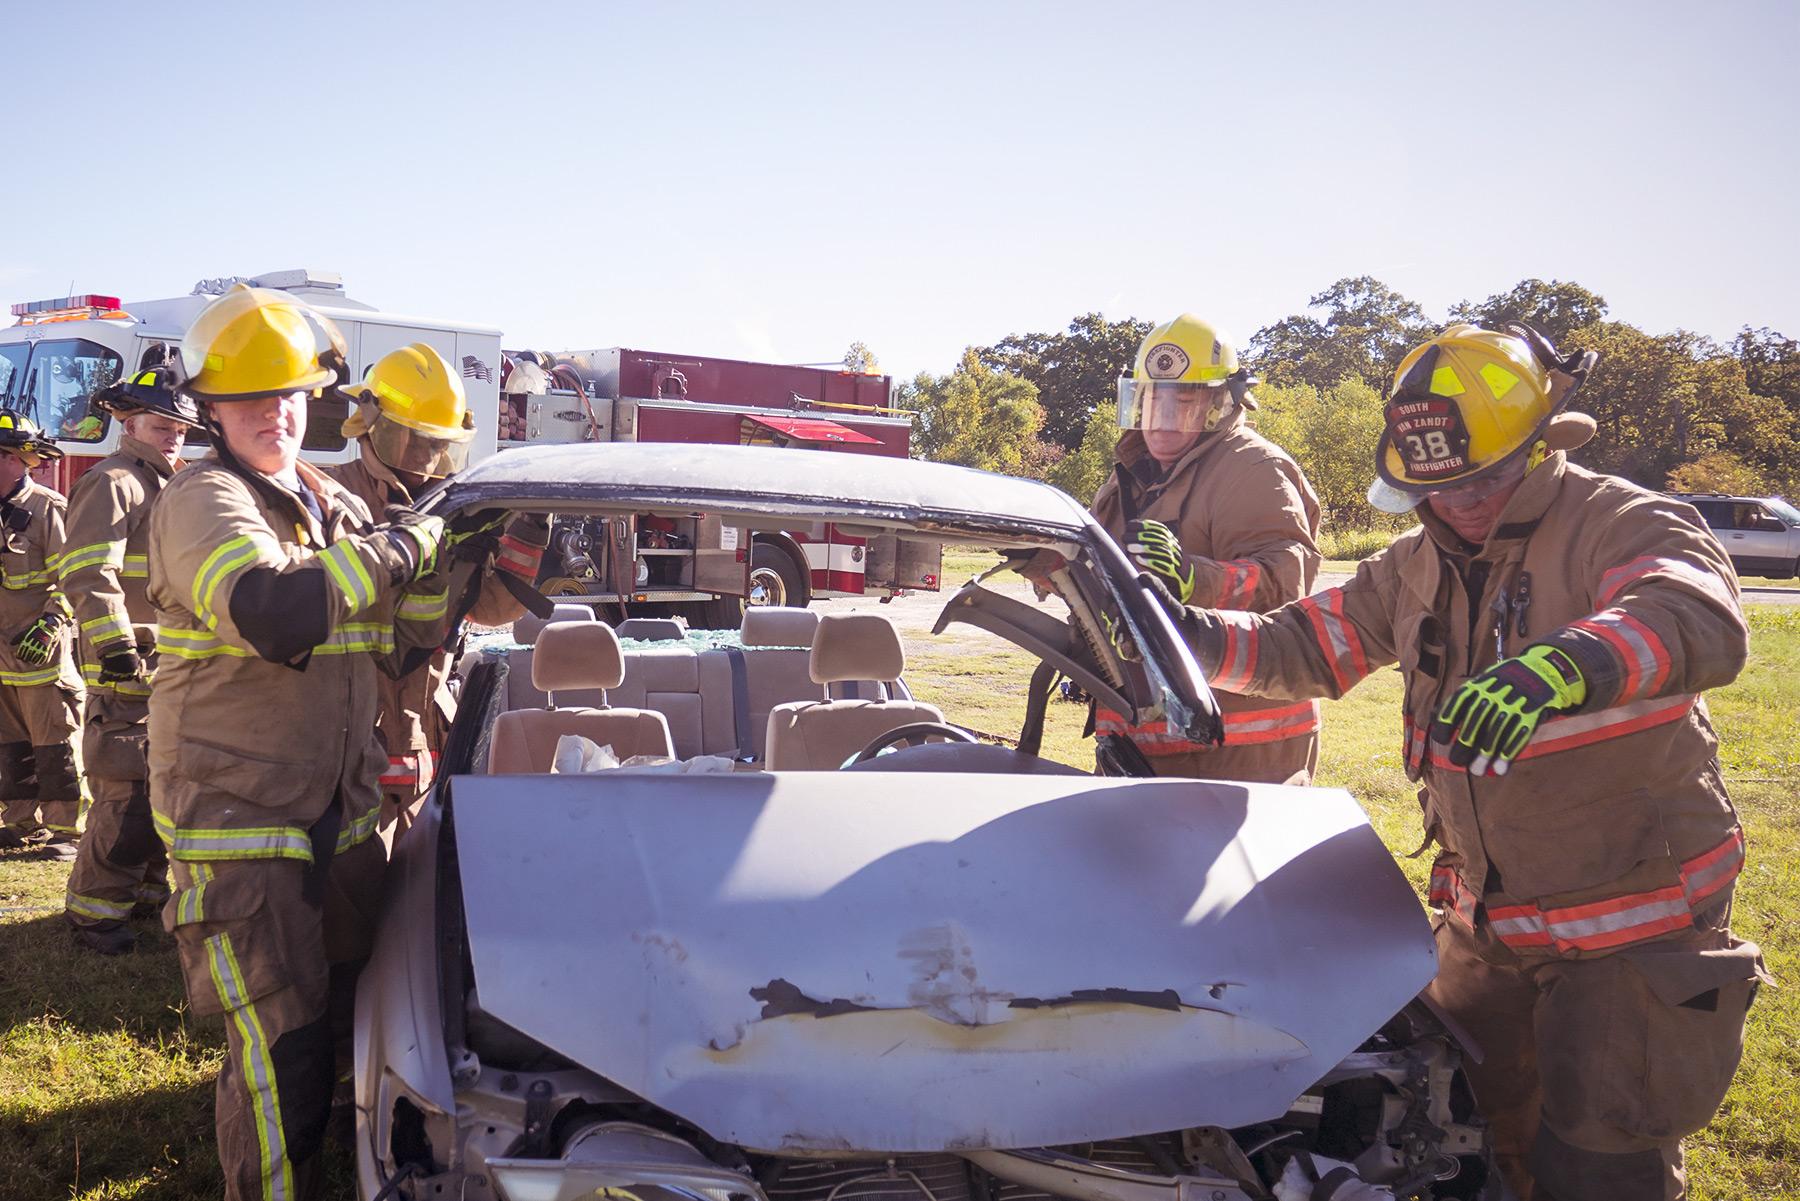 volunteer firefighters of Van Zandt county texas dismantle car during extraction training